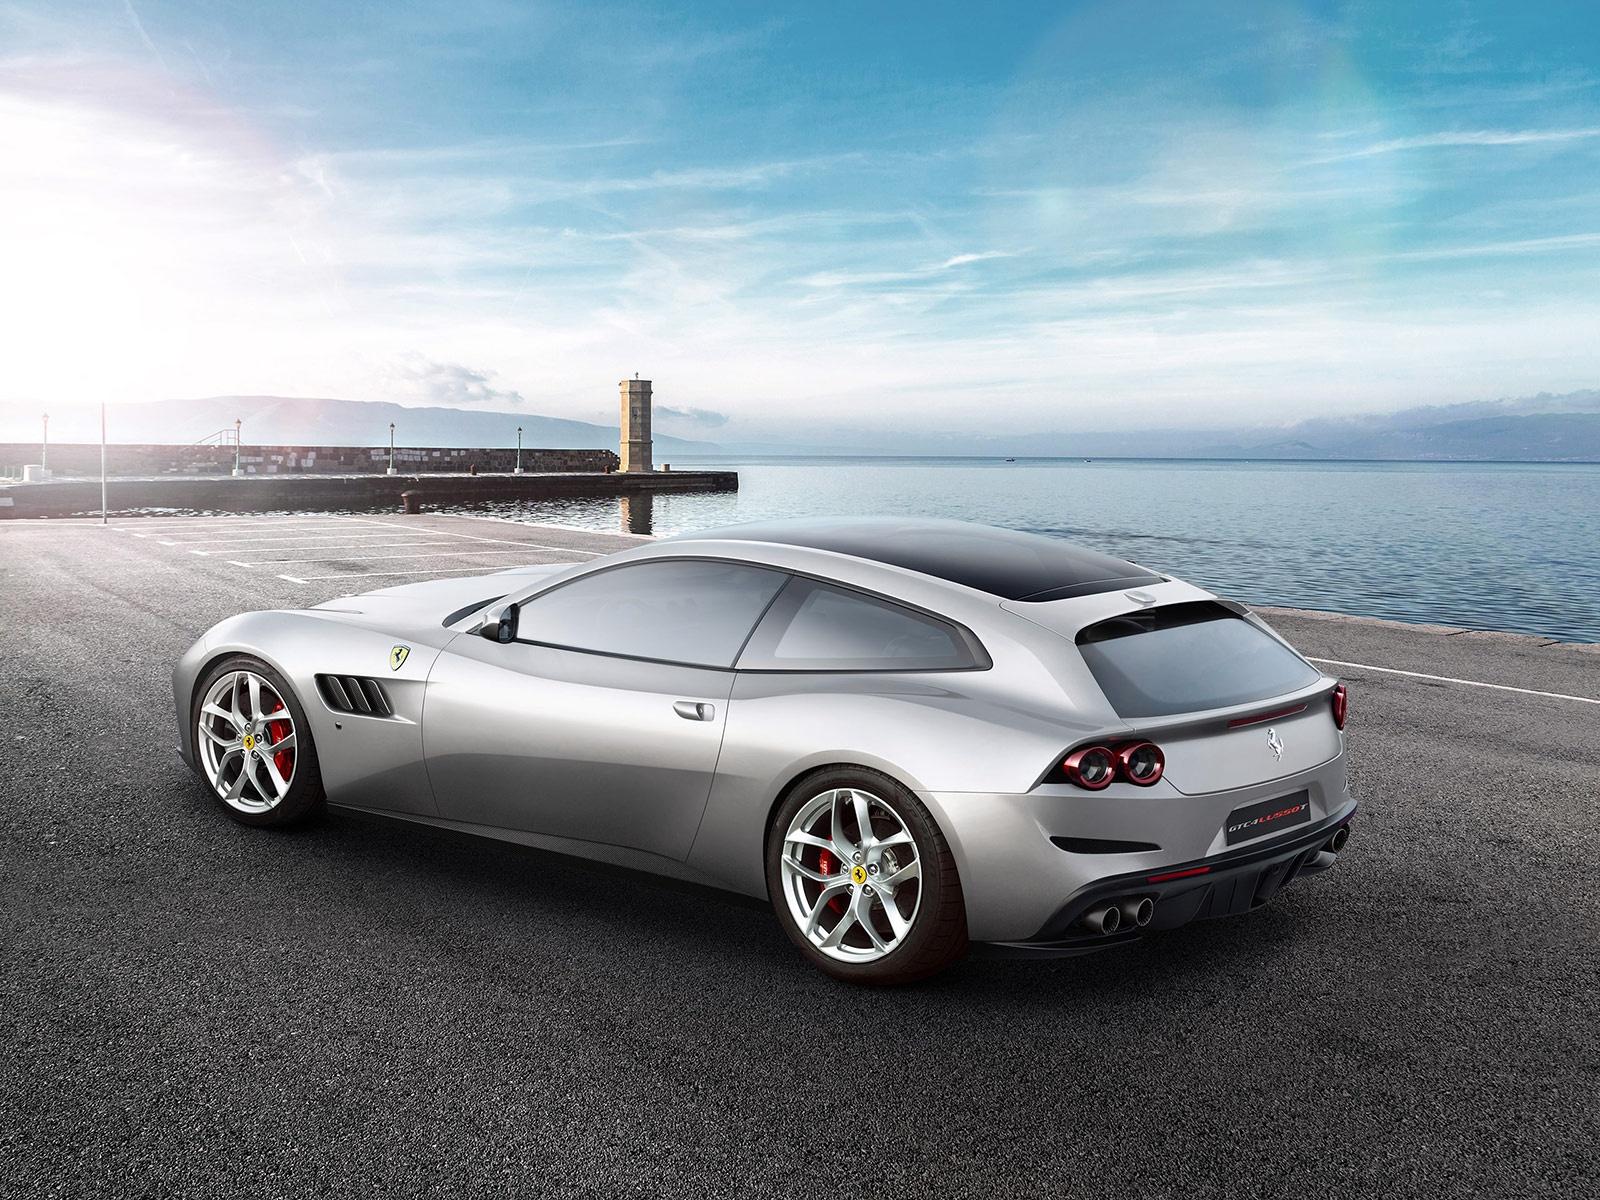 New-2019-Ferrari-GTC4LUSSO-T